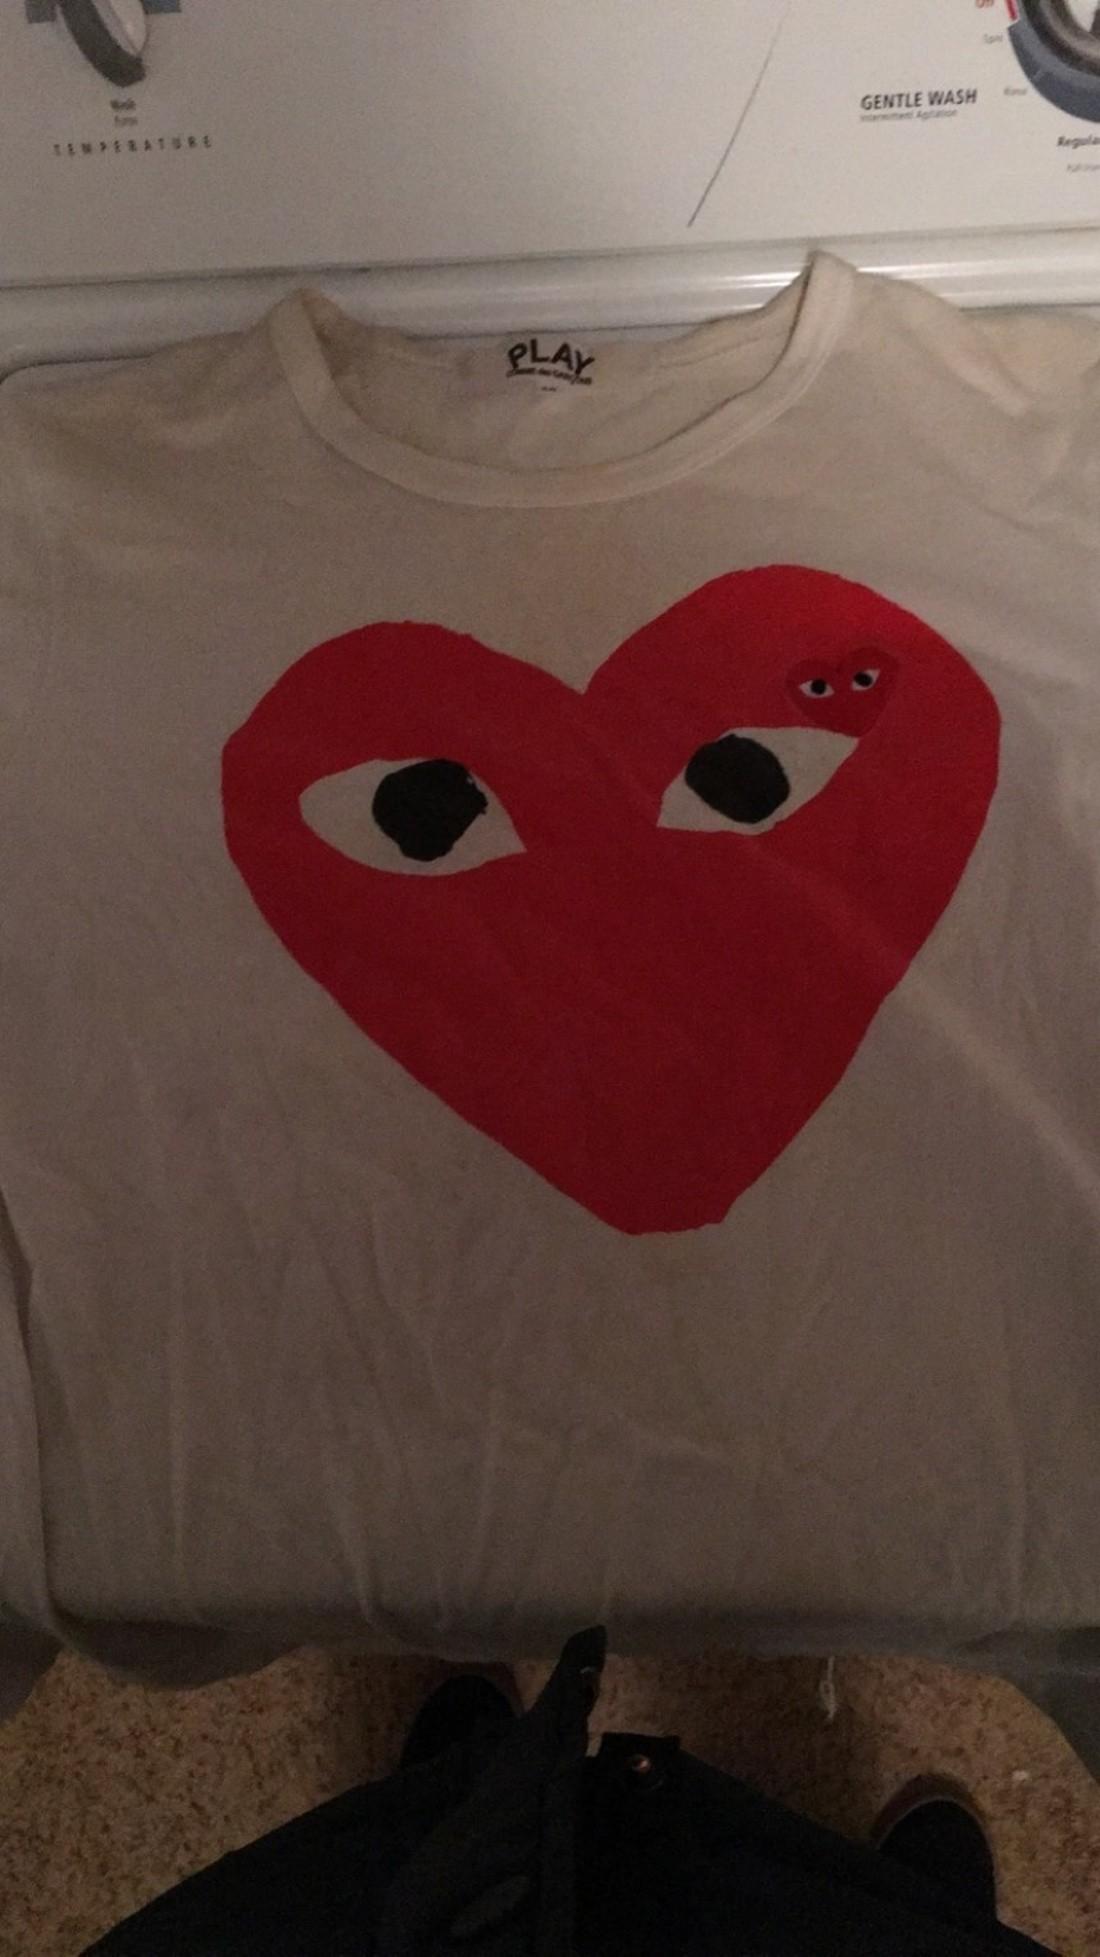 Legit Check On CDG Play Shirt?   Styleforum